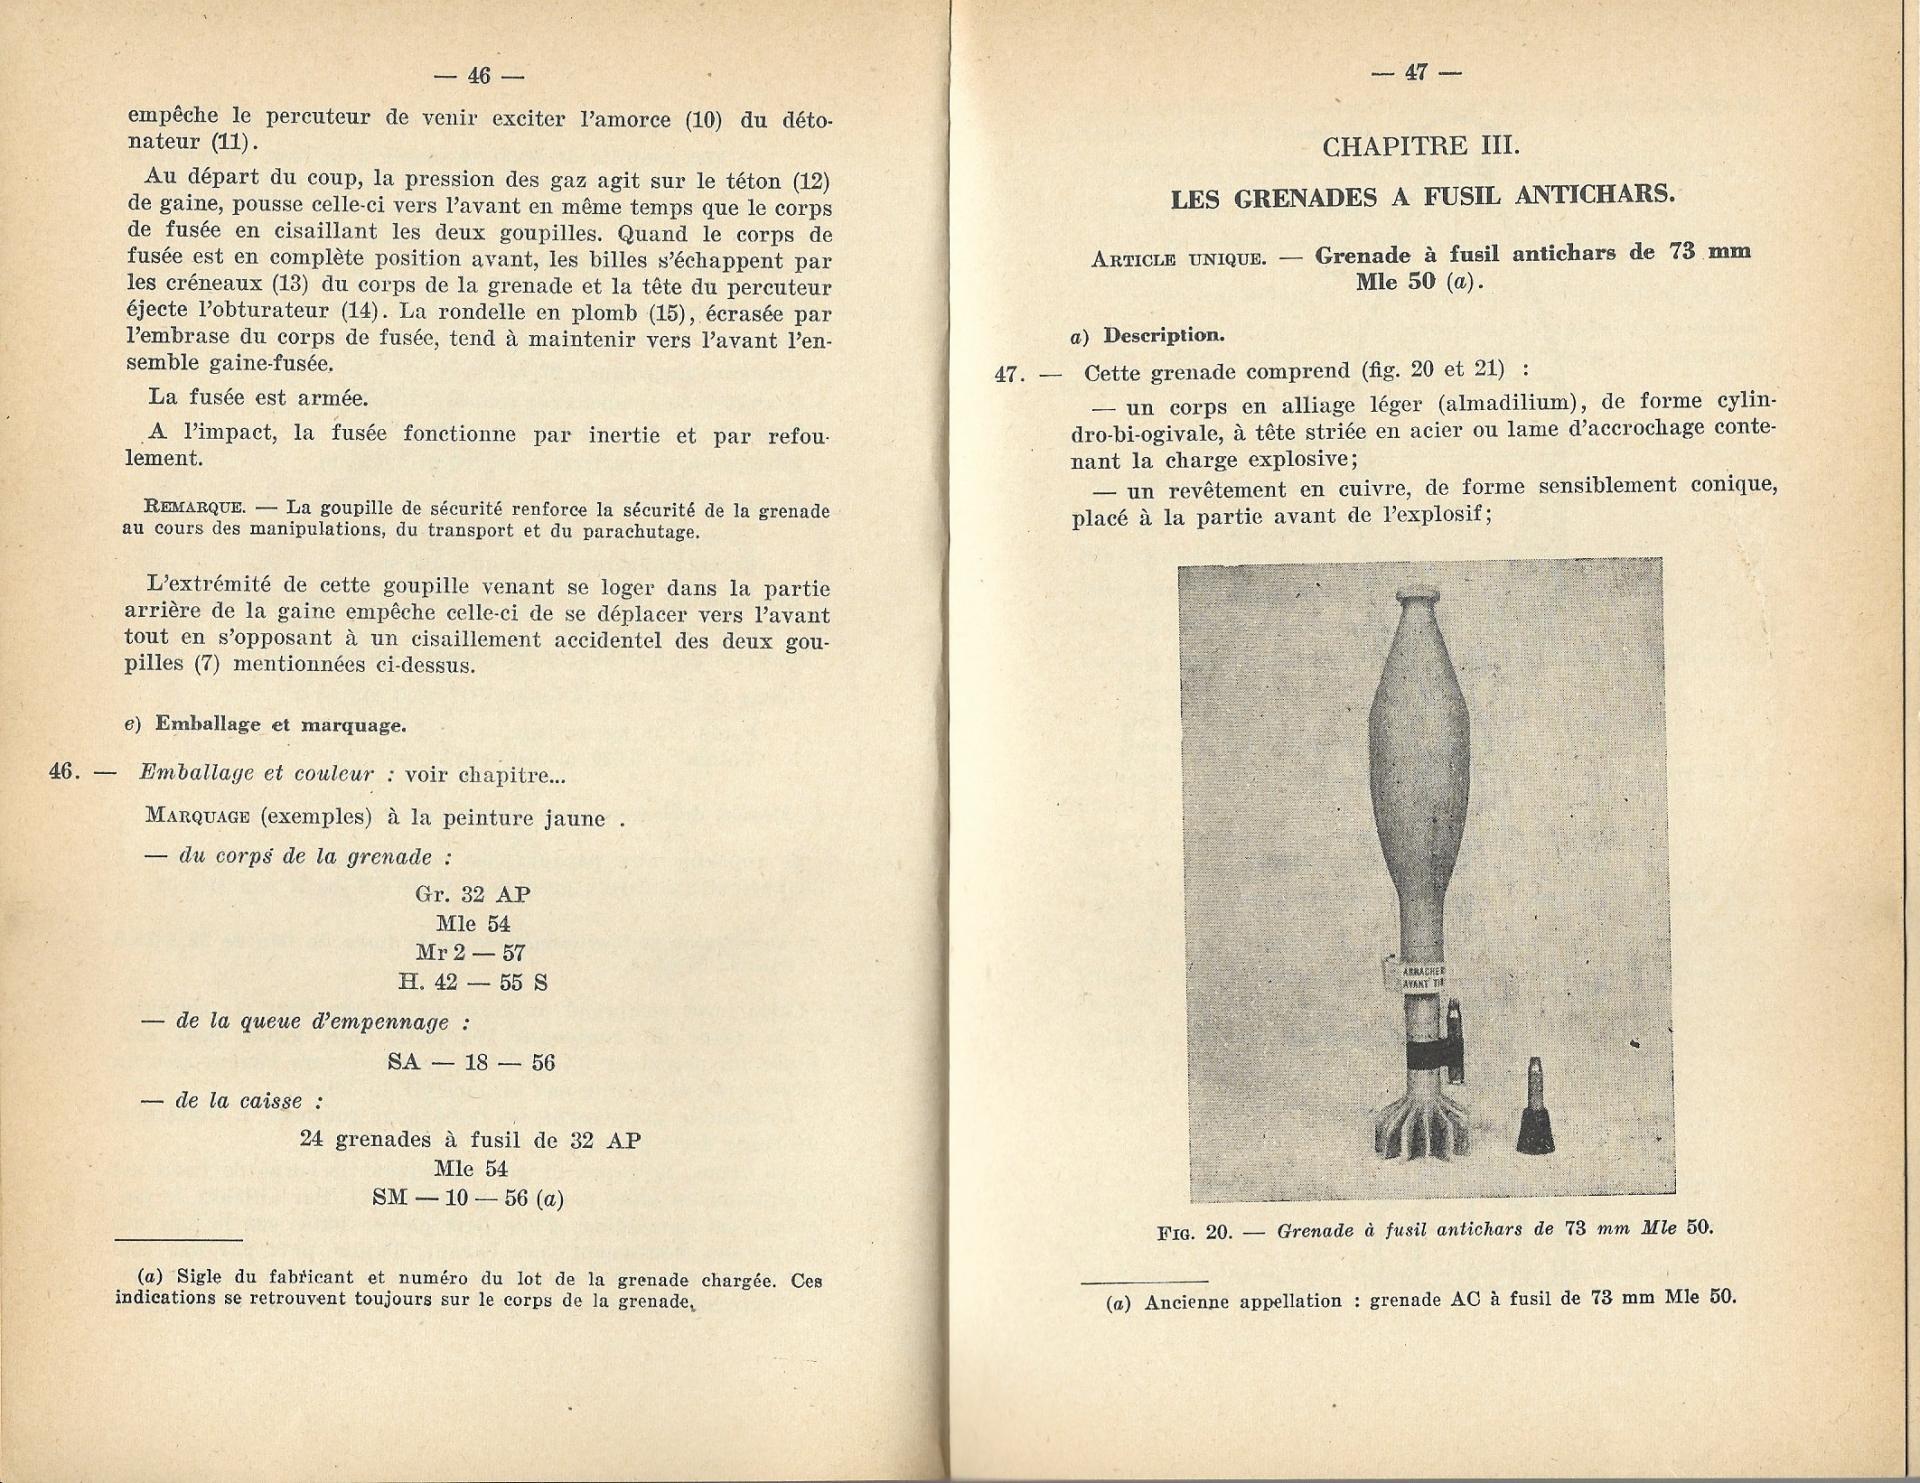 Grenades a fusil 1957 p46 47 1